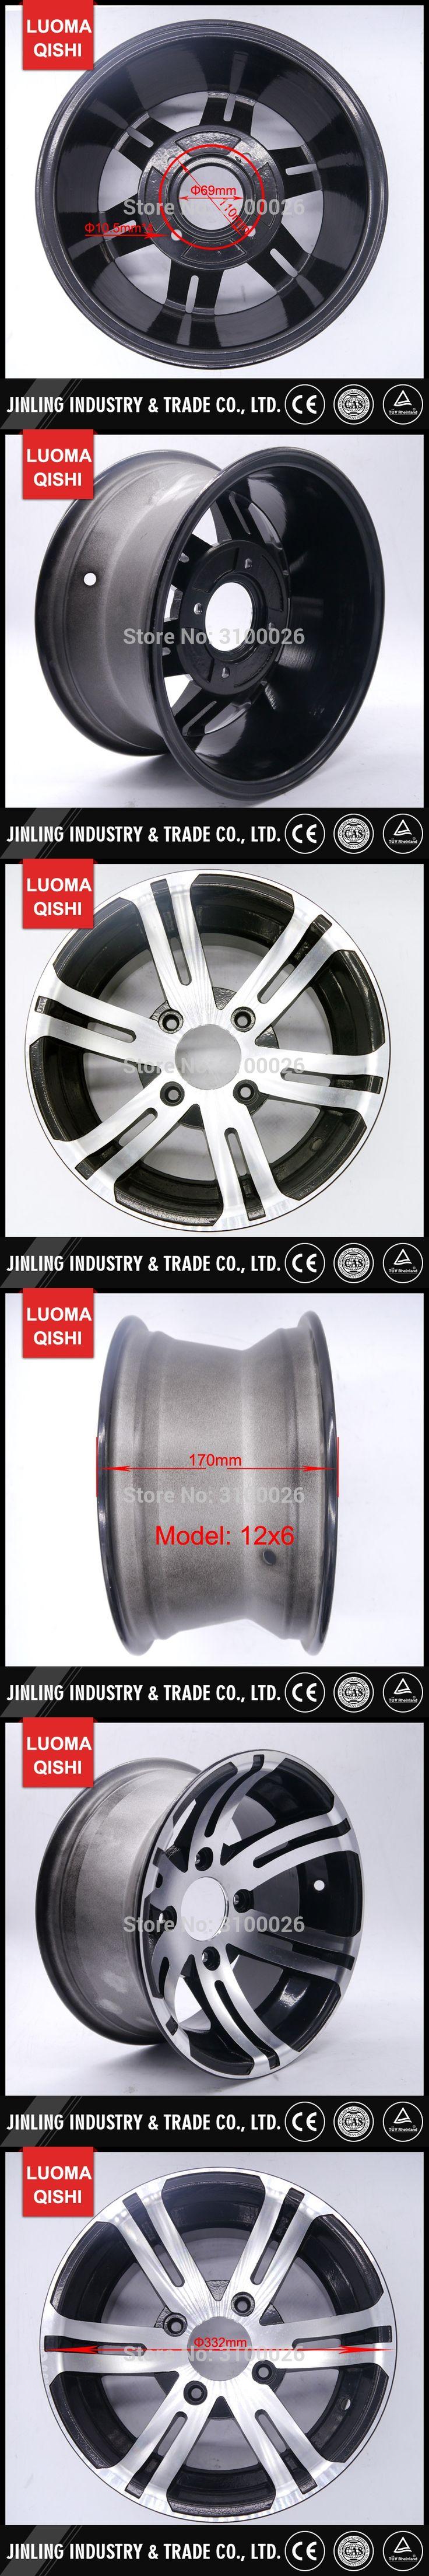 12x6 Alloy Aluminium Rim Fit For 12 Inch Tire Wheel 205 30 Racing